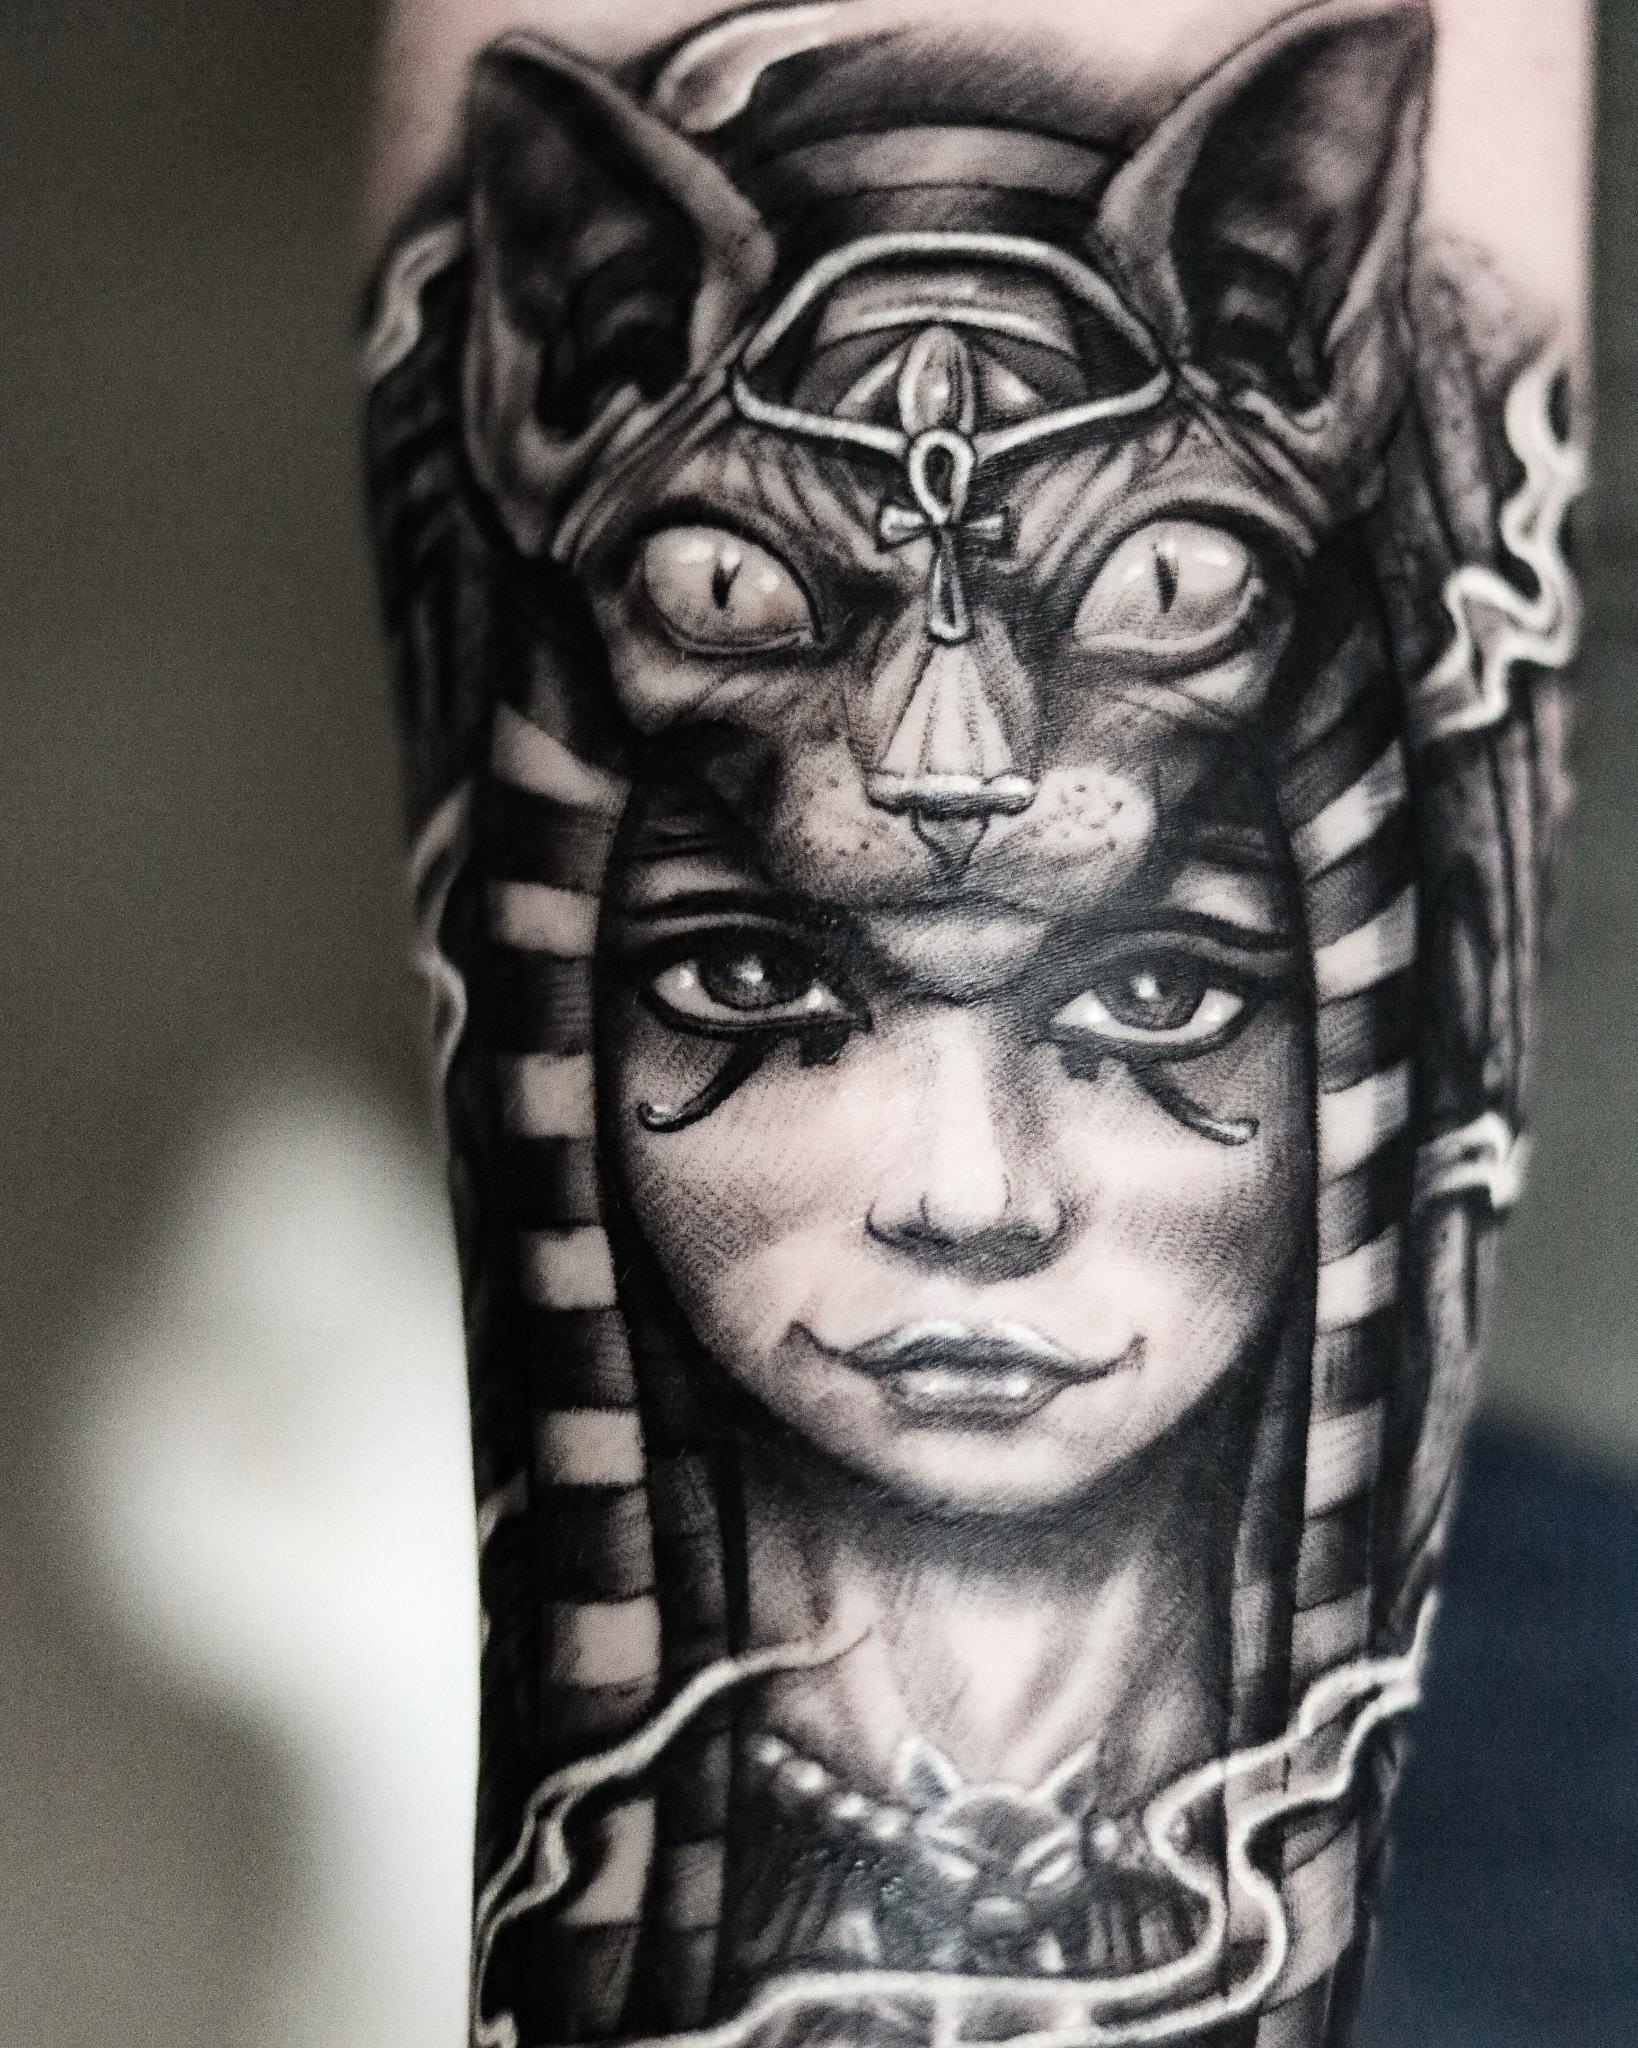 my wife's new tattoo by Aaron fields